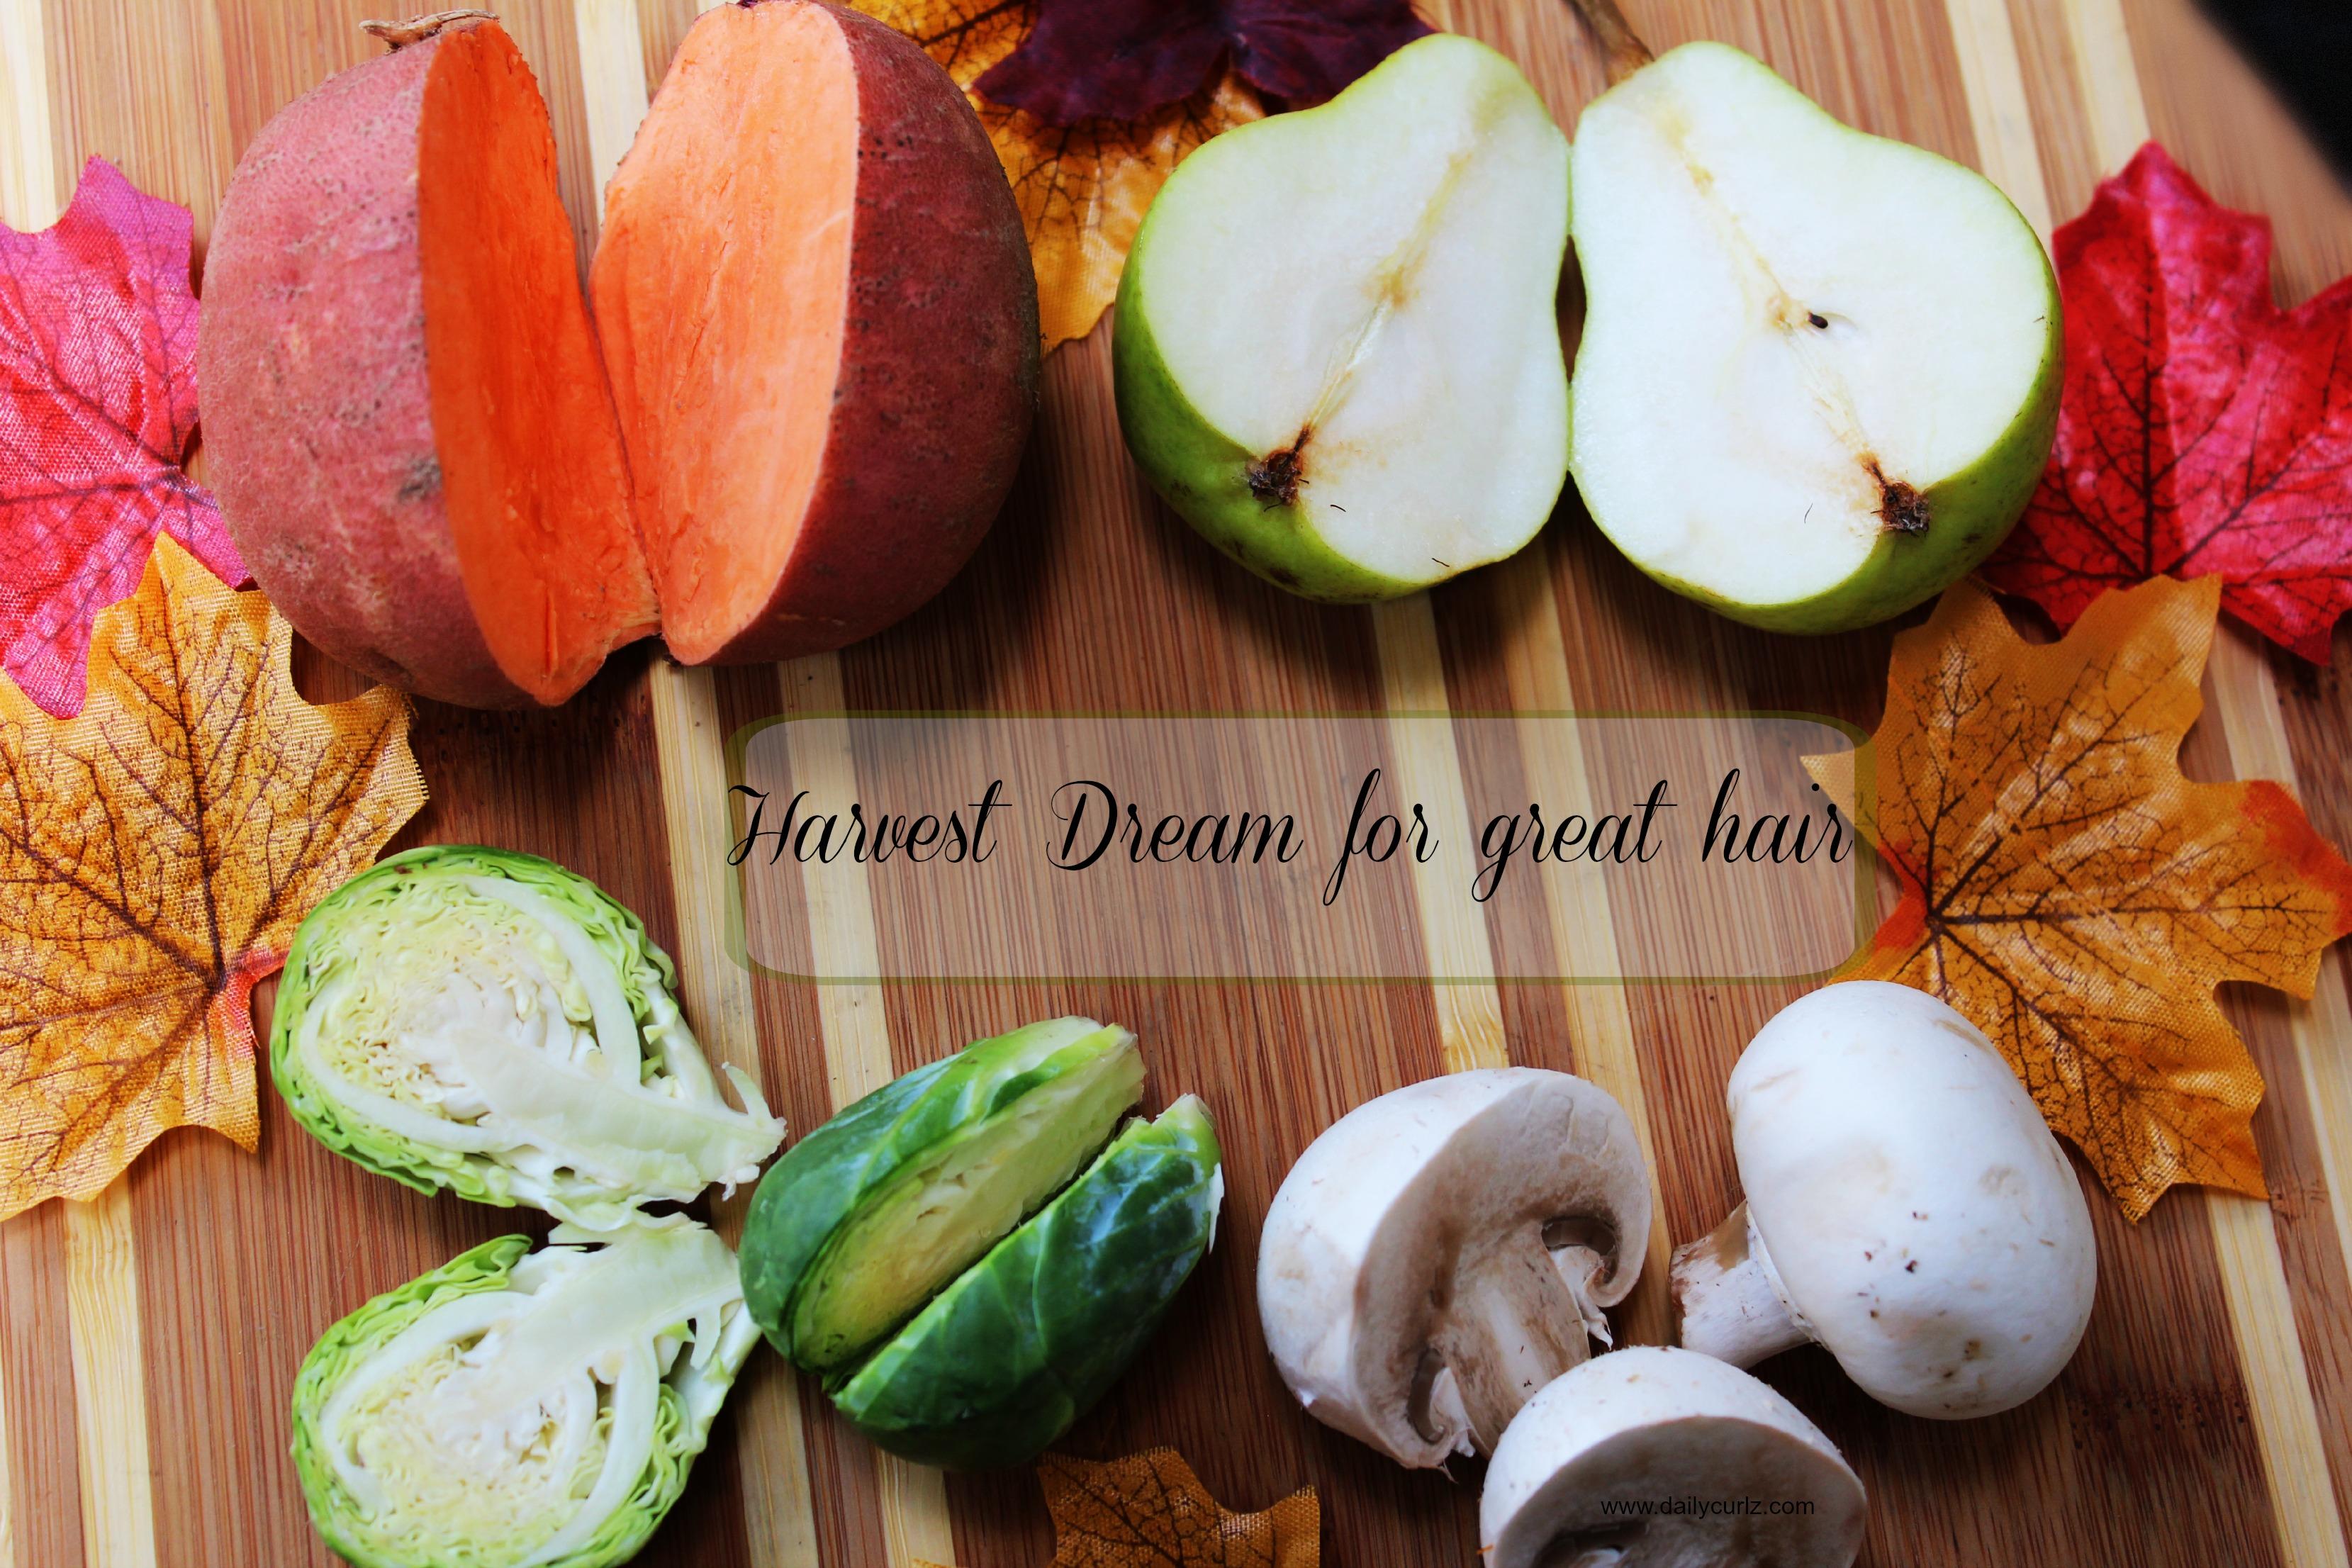 Harvest dream for great hair / Que comer este otoño para un cabello saludable